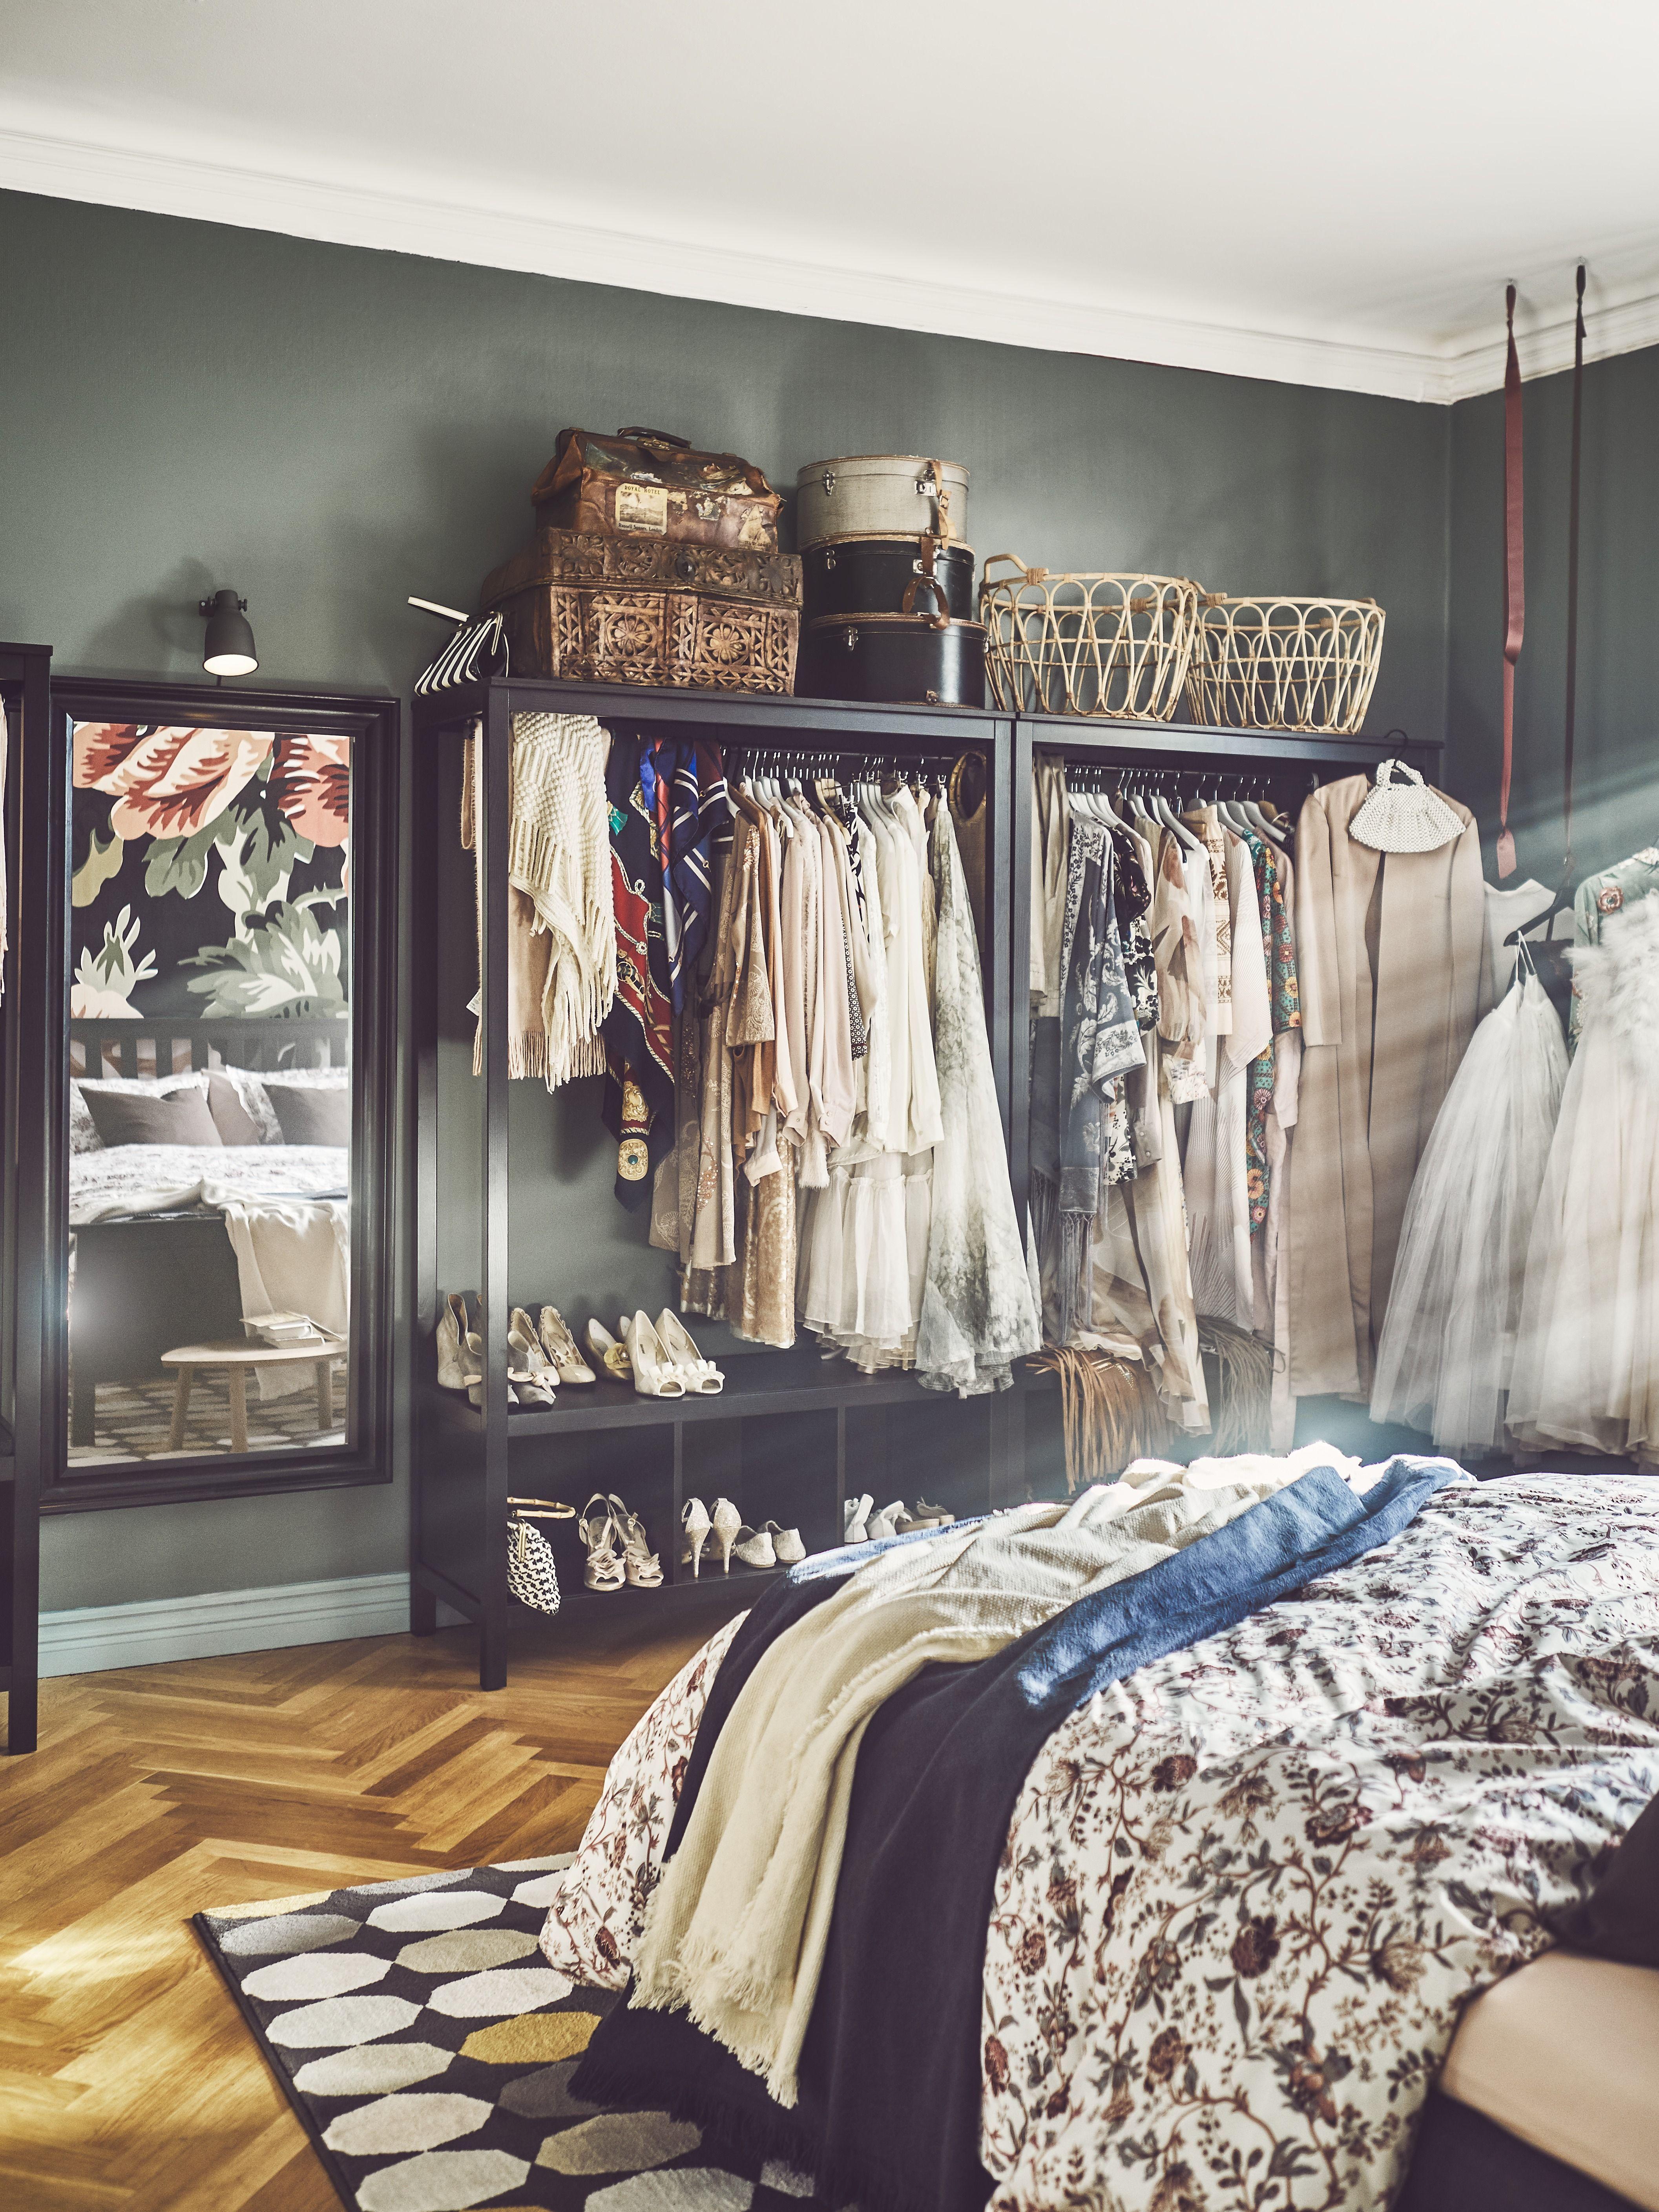 20 La Casa De Marie Claire Decoracion 2018 Check More At Https